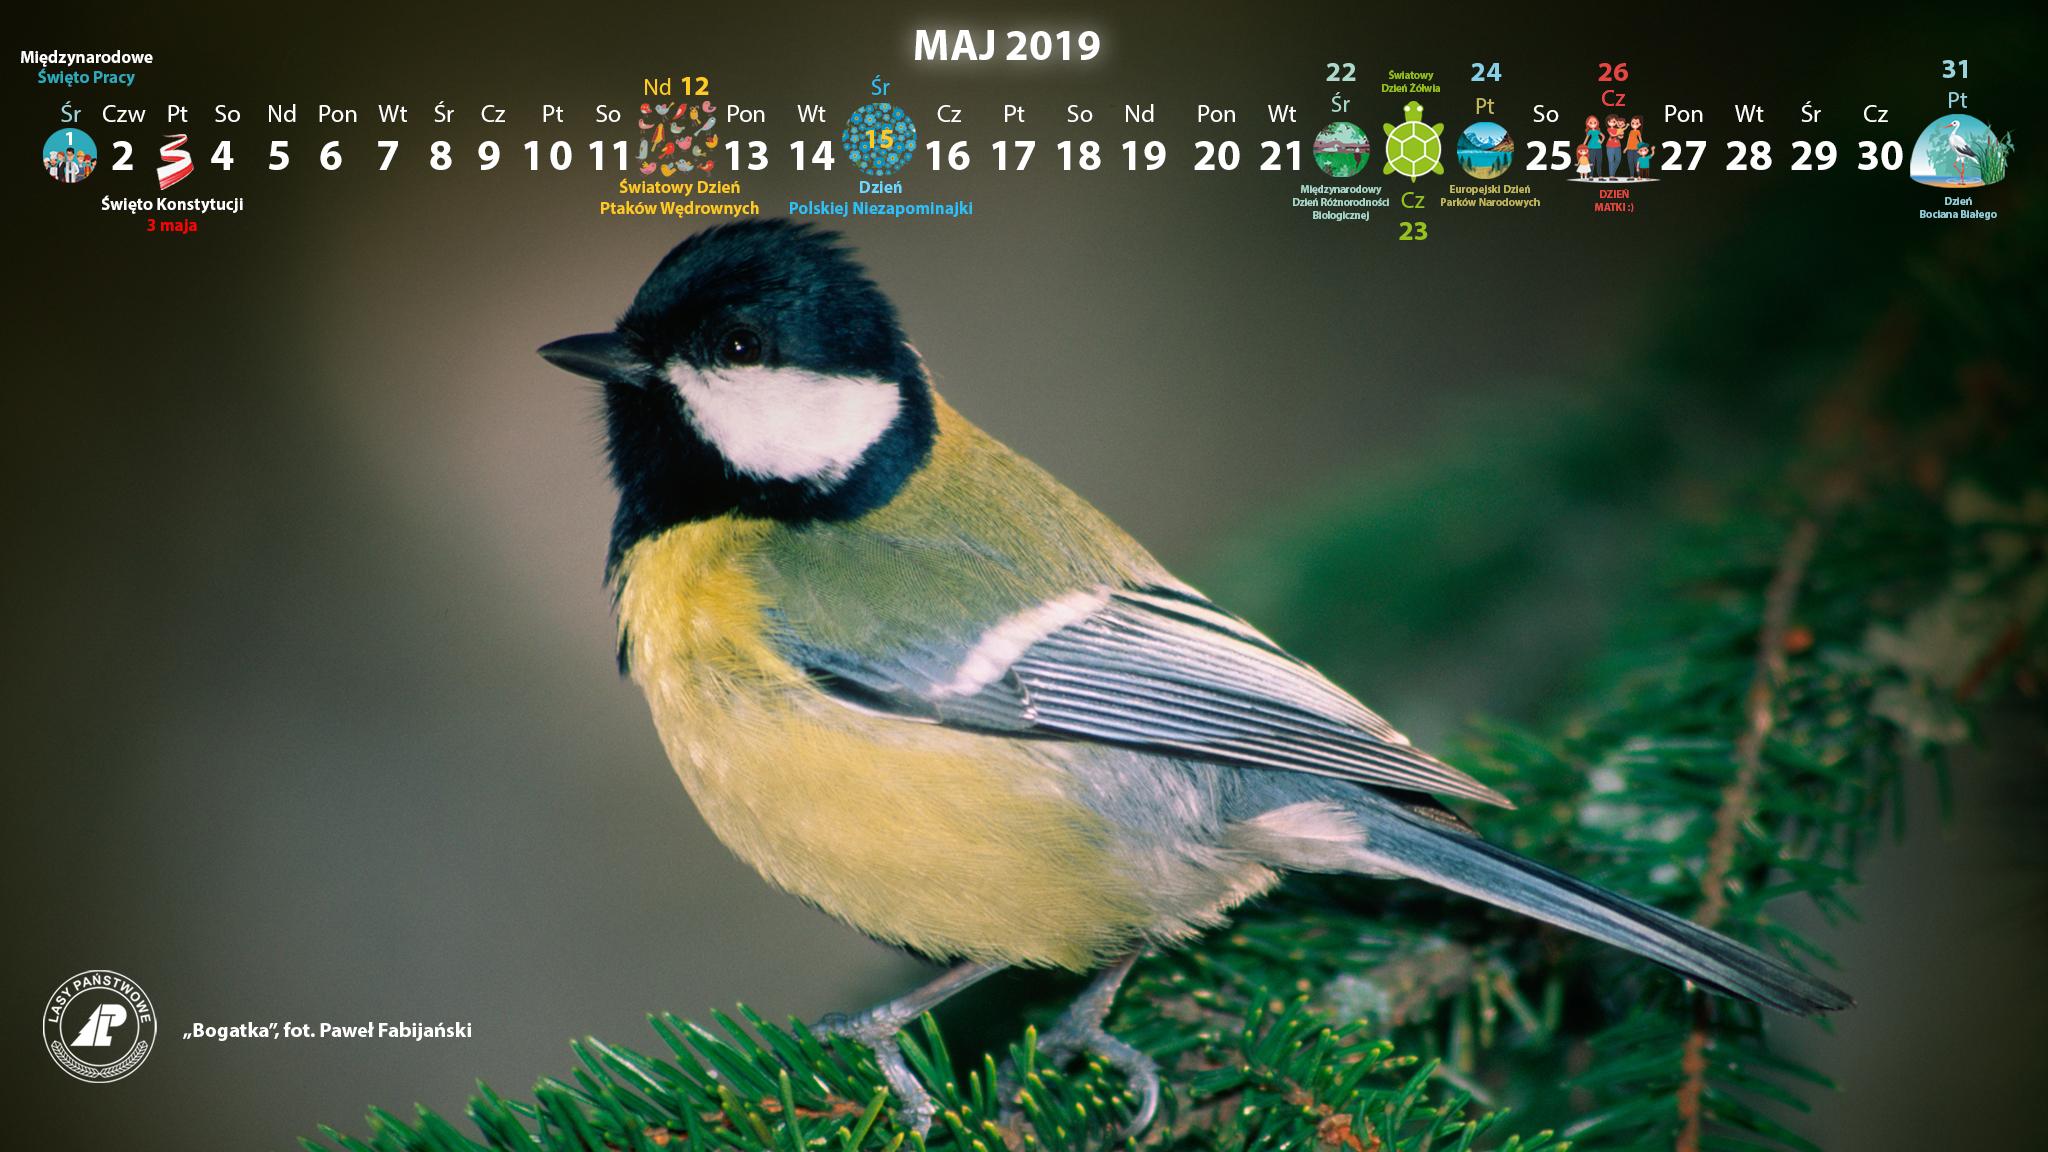 Kalendarz_maj_2019_2048x1152[1].jpg